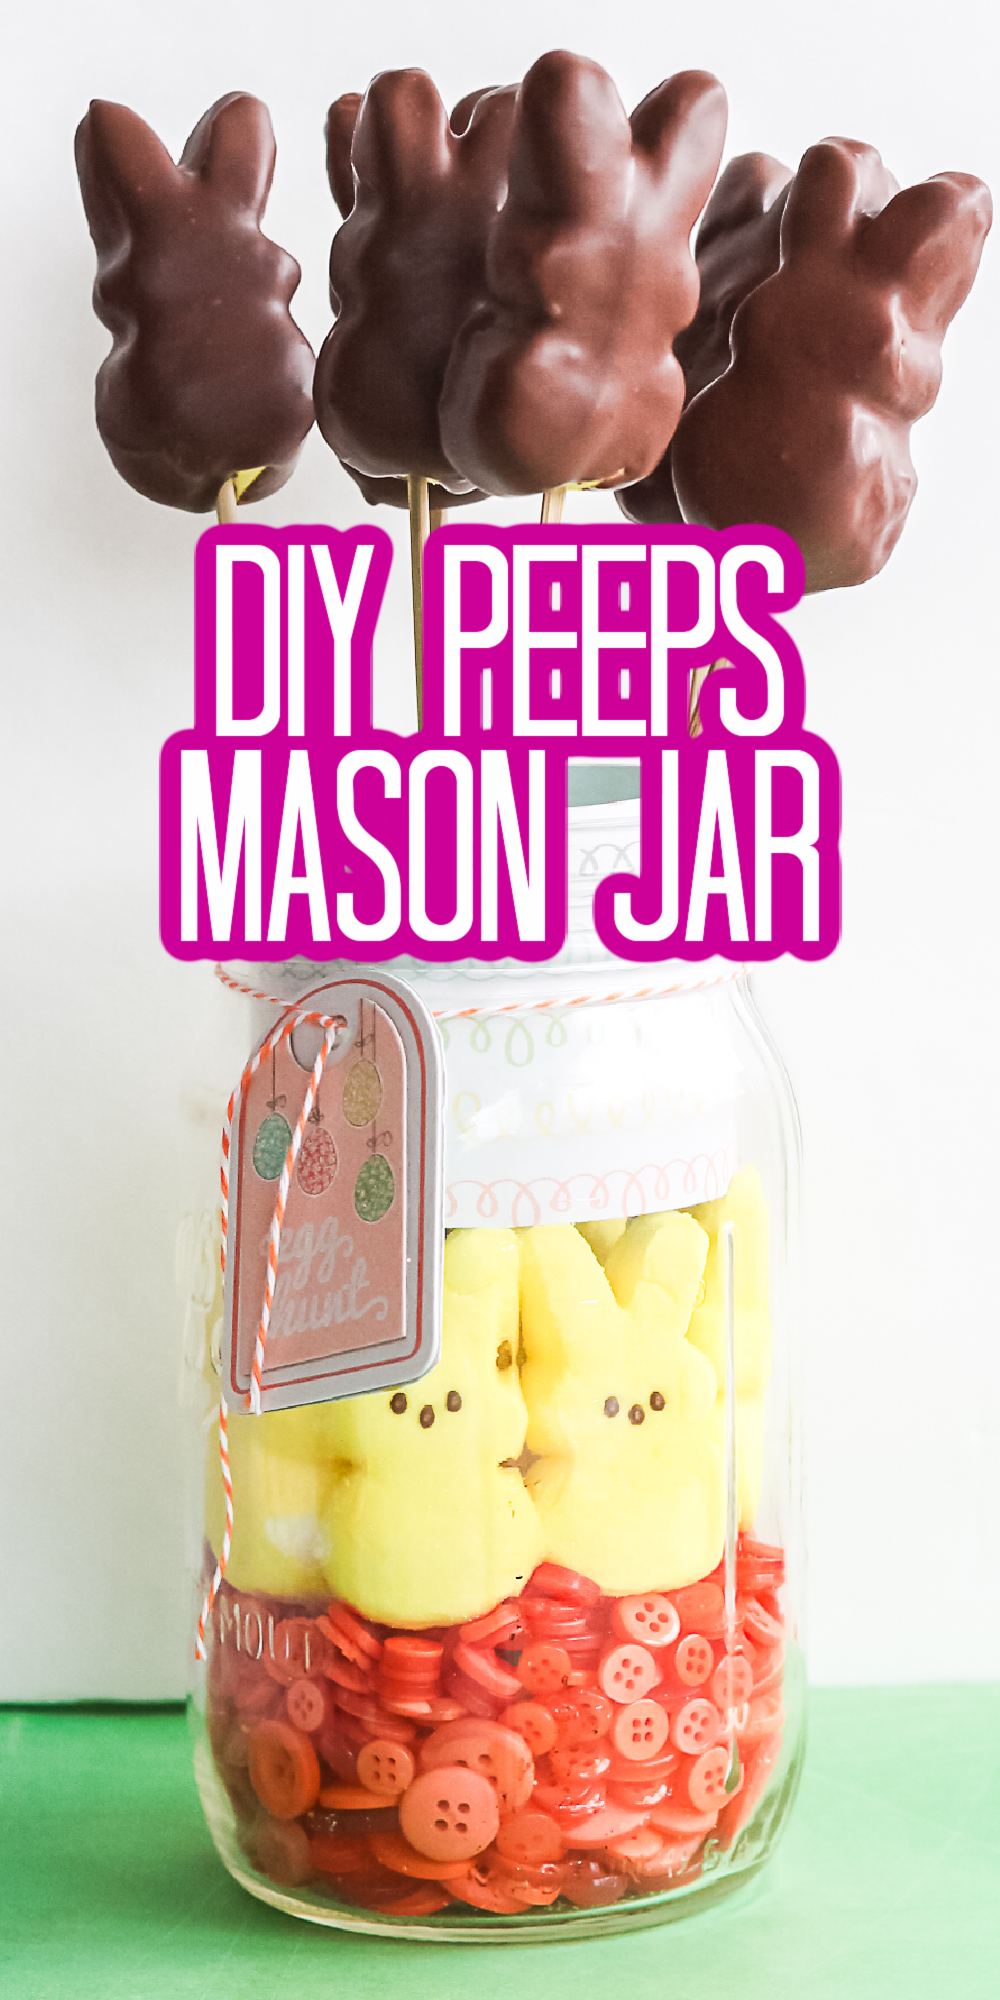 diy peeps mason jar